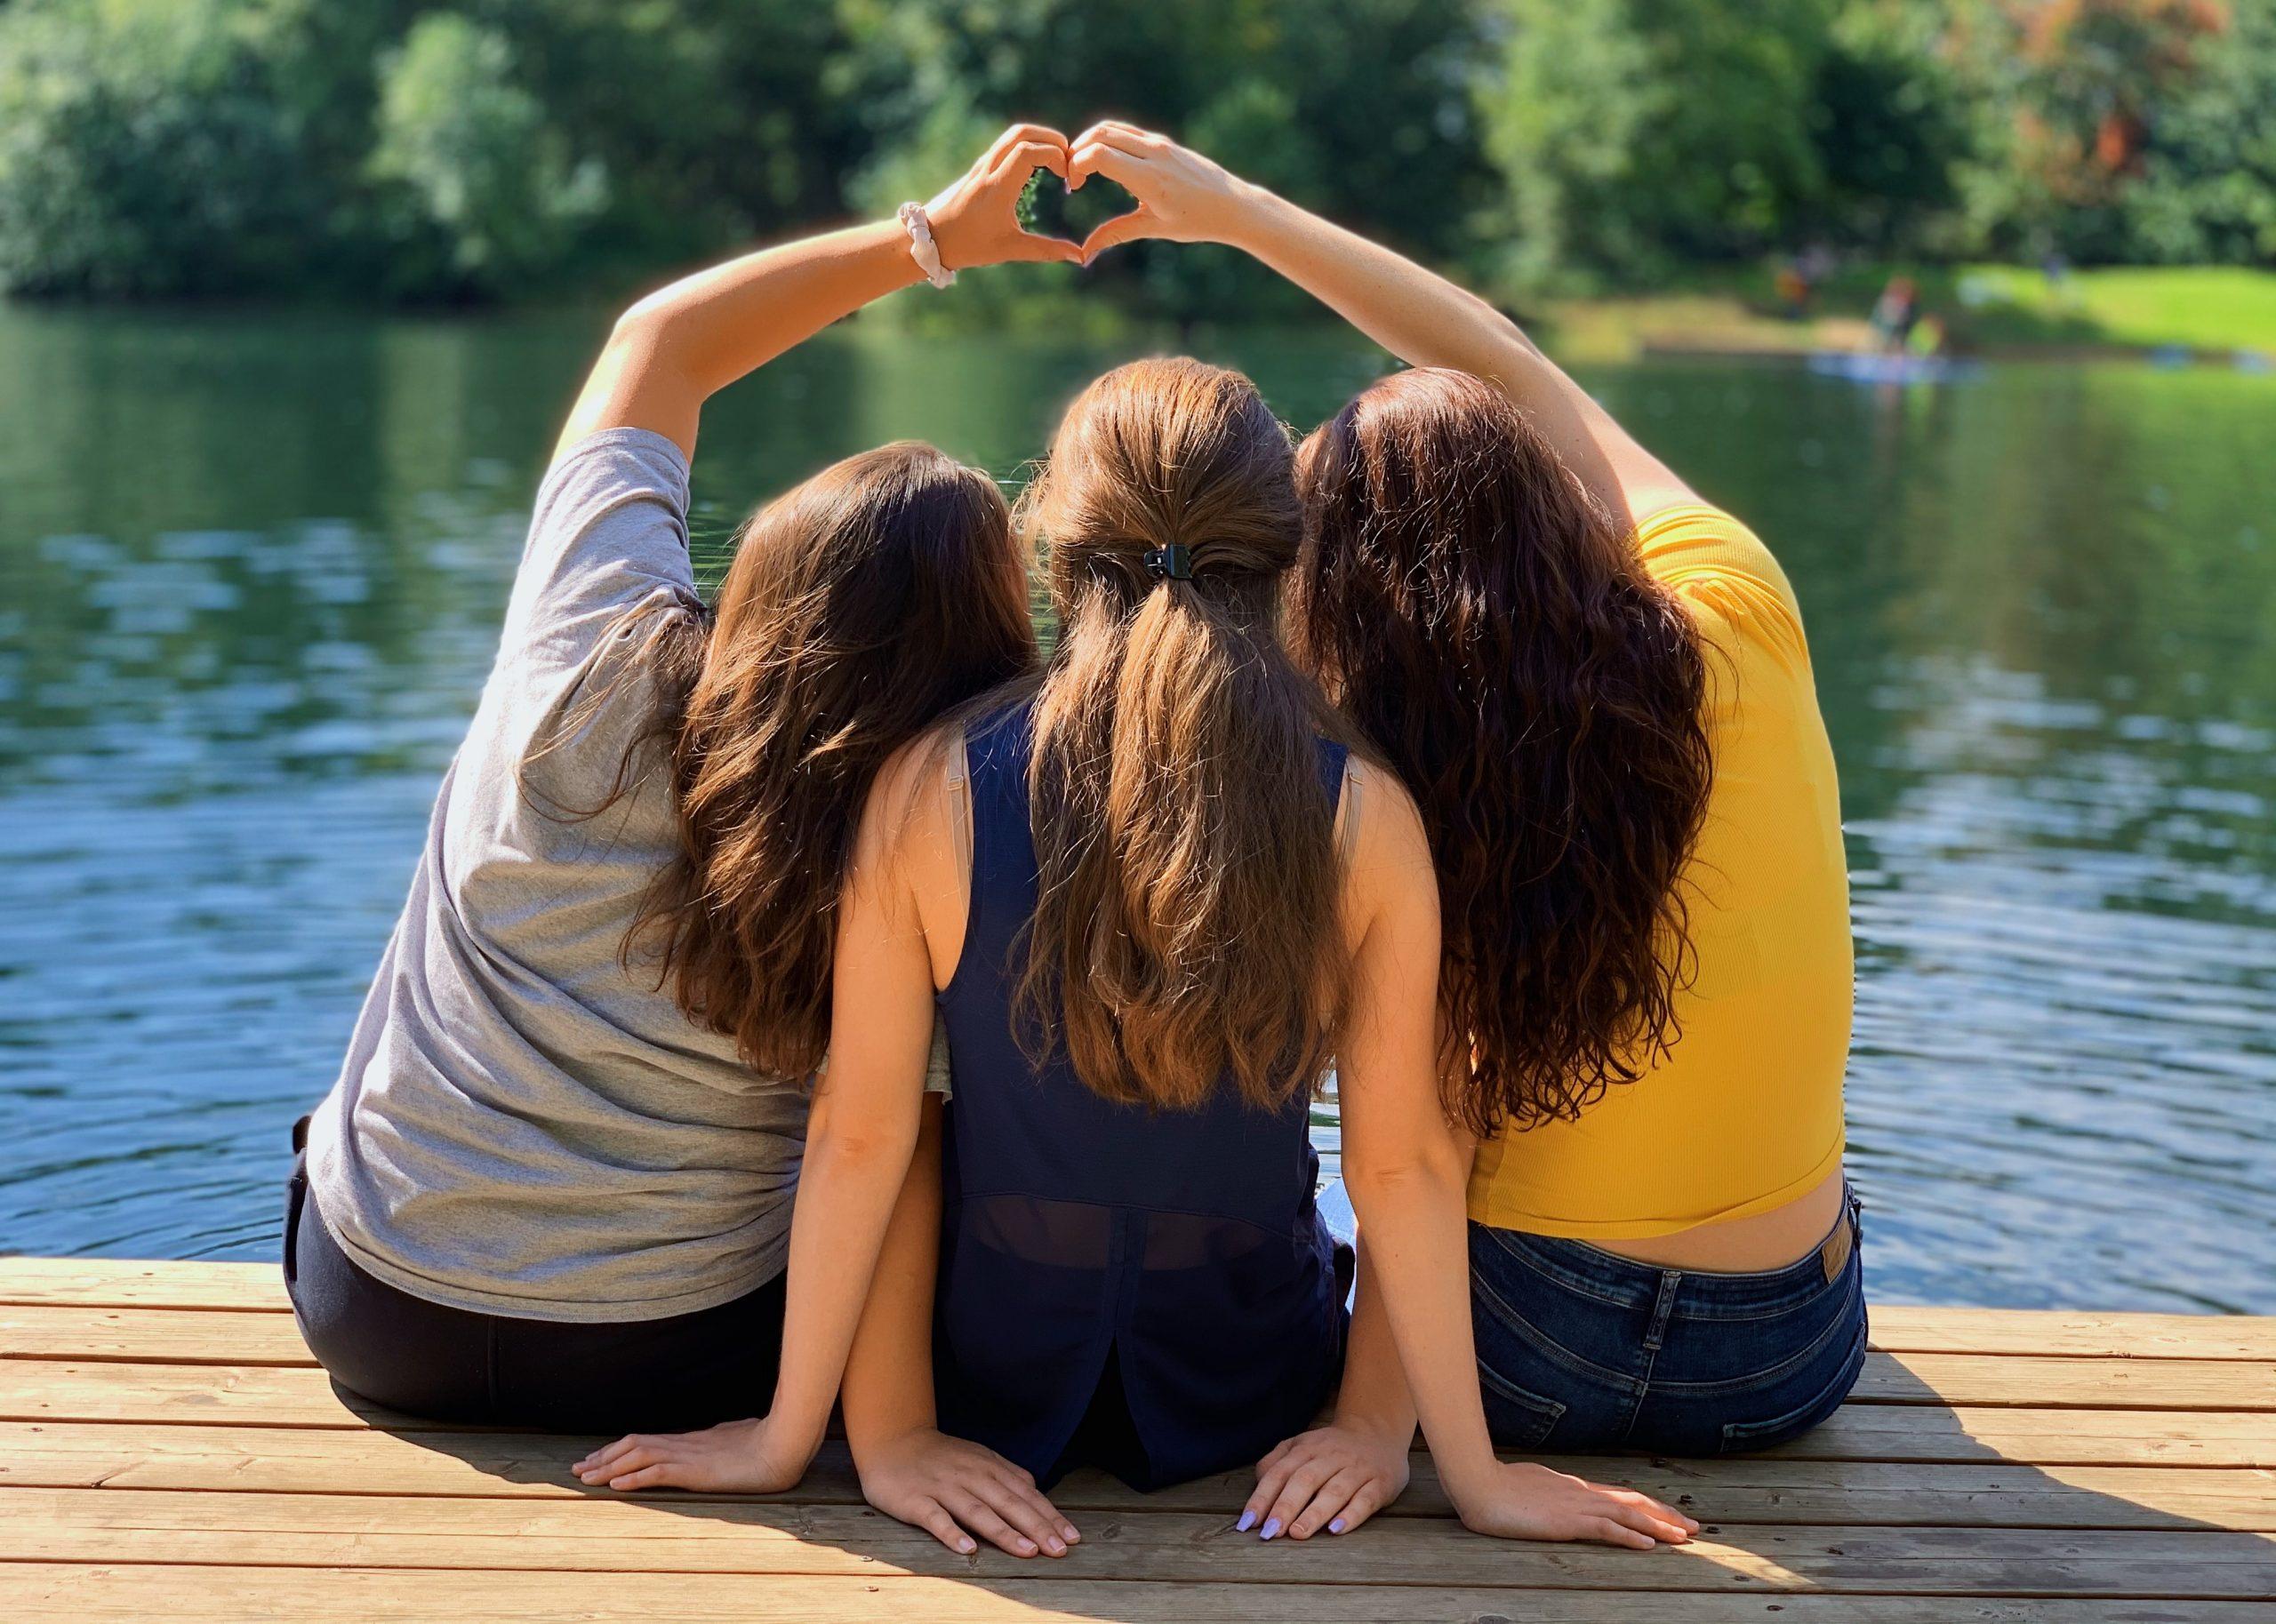 2 women sitting on wooden dock during daytime